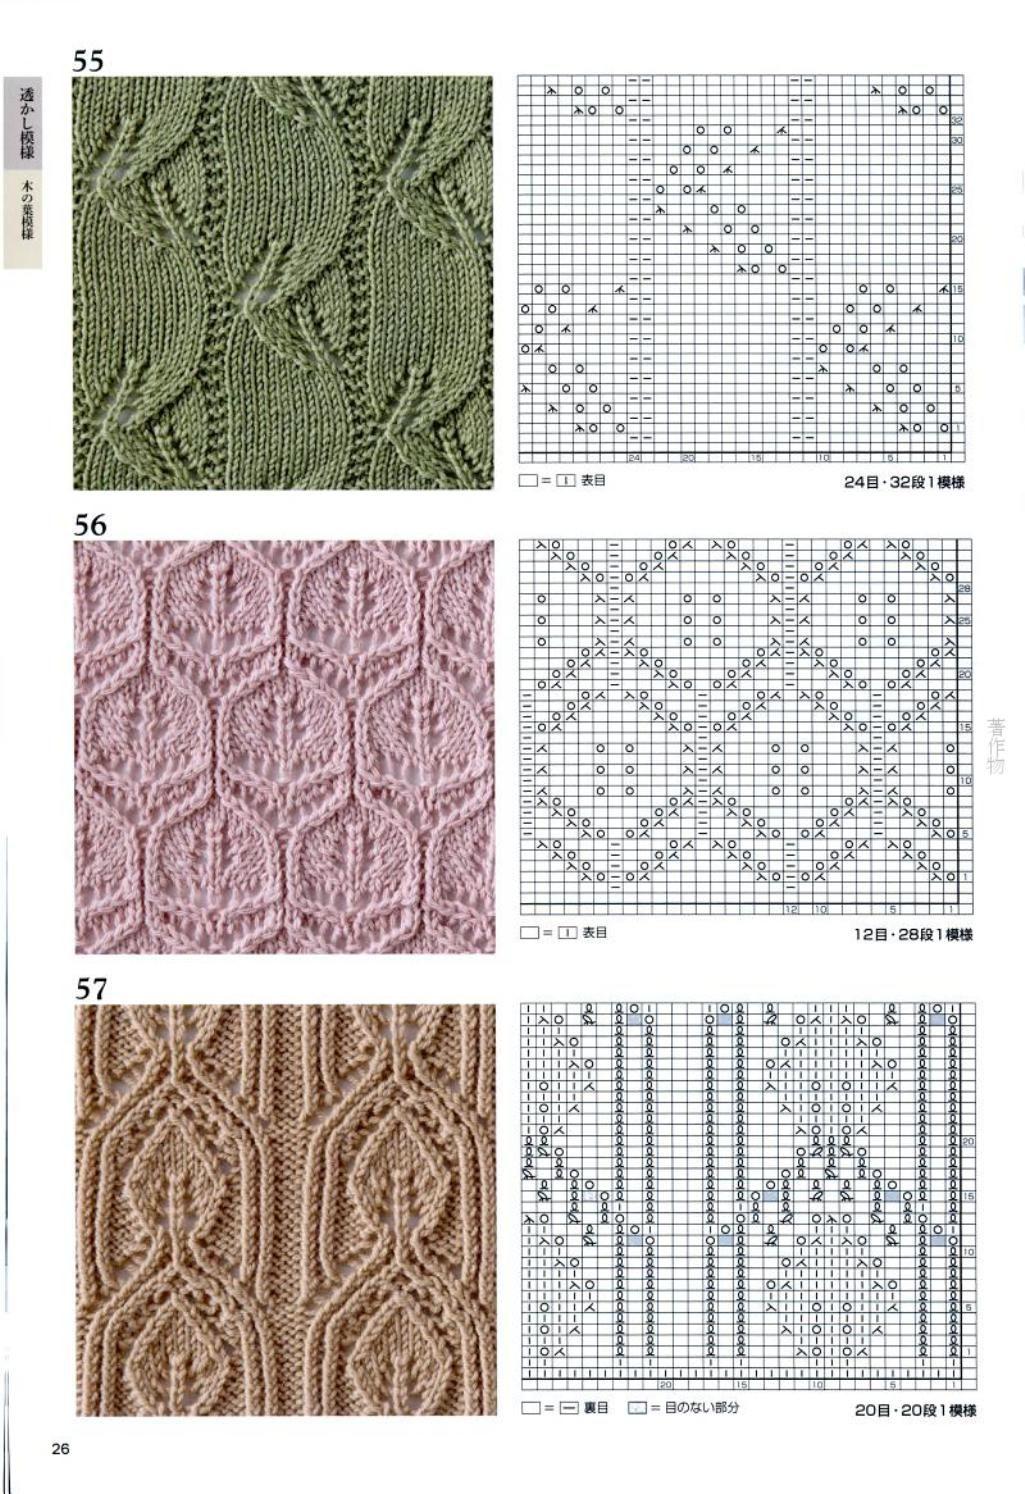 Pin de Gabriela Terrones en Tricot | Pinterest | Tricotar, Croché y ...